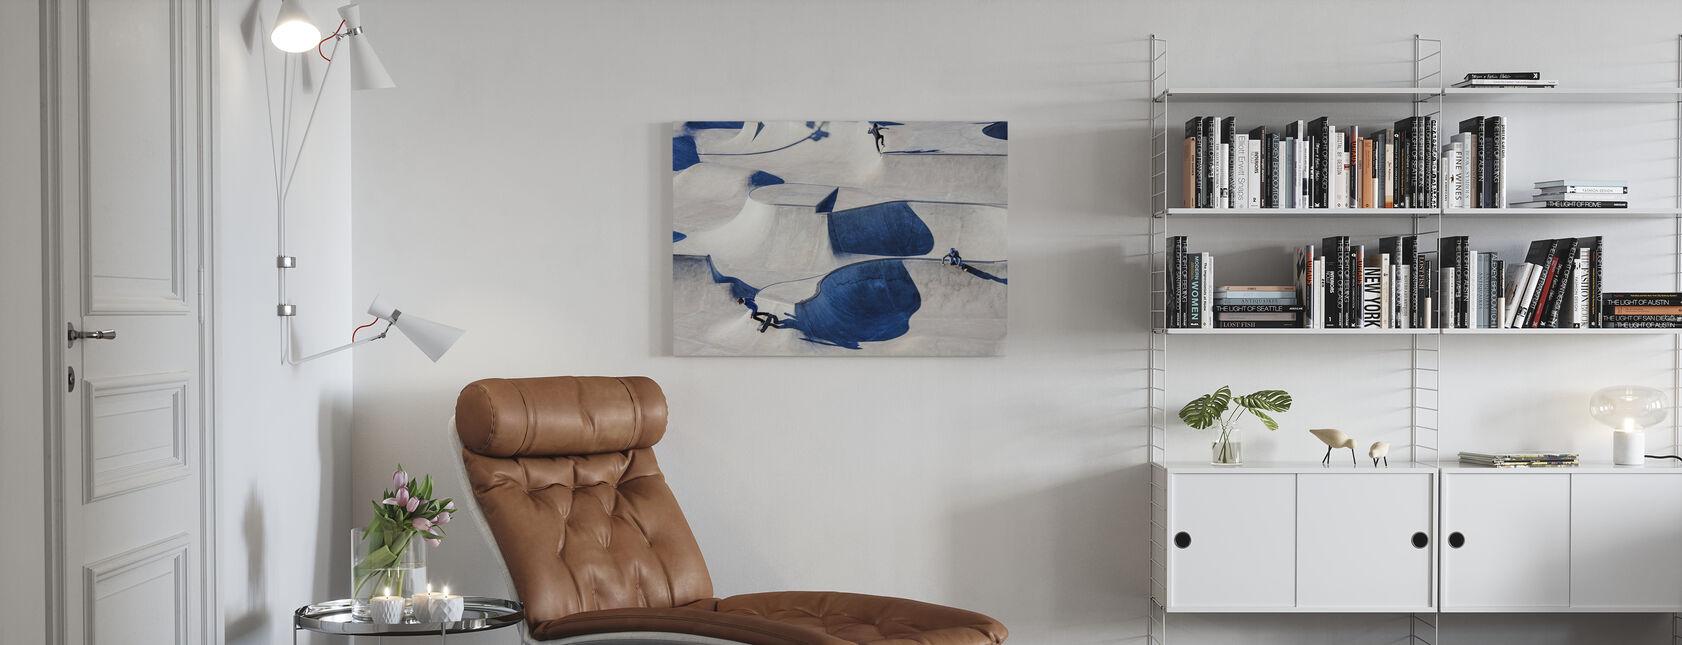 Skateboarding in Park - Canvas print - Living Room